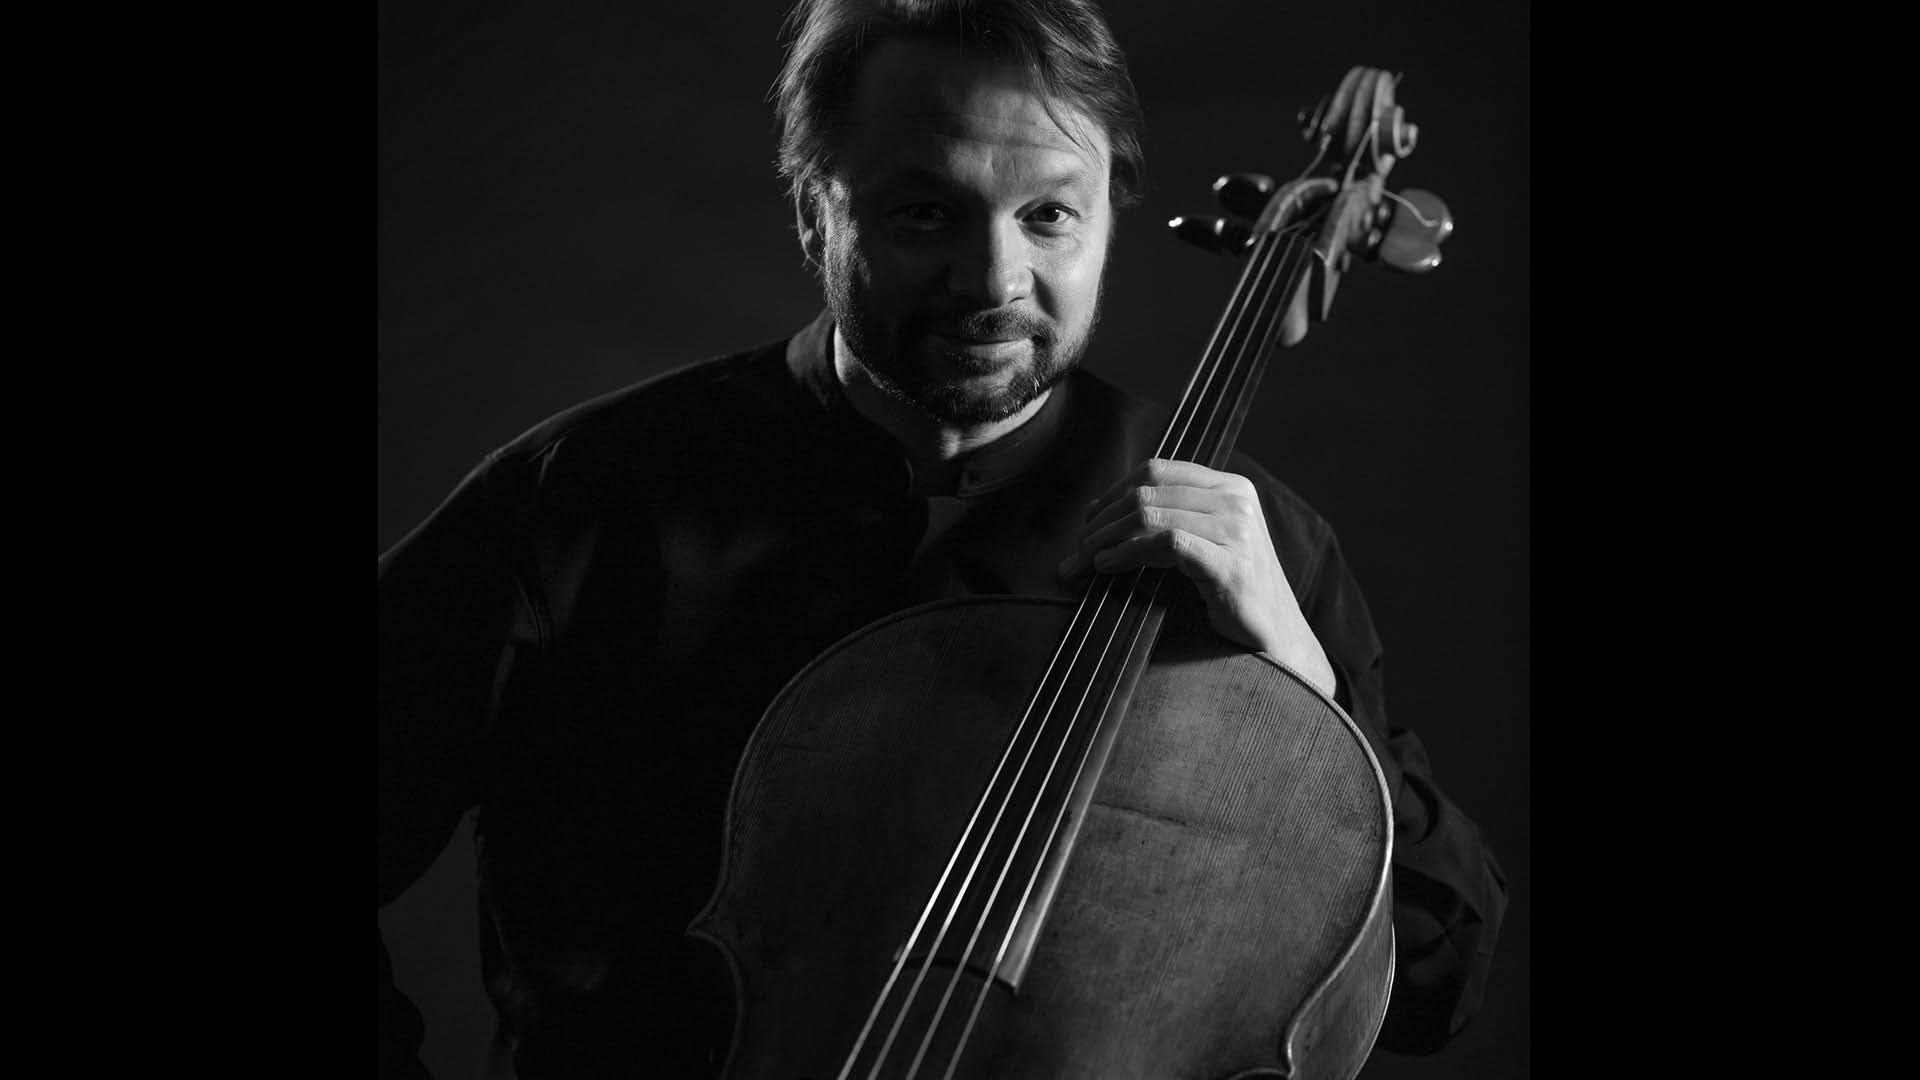 Marko Ylönen